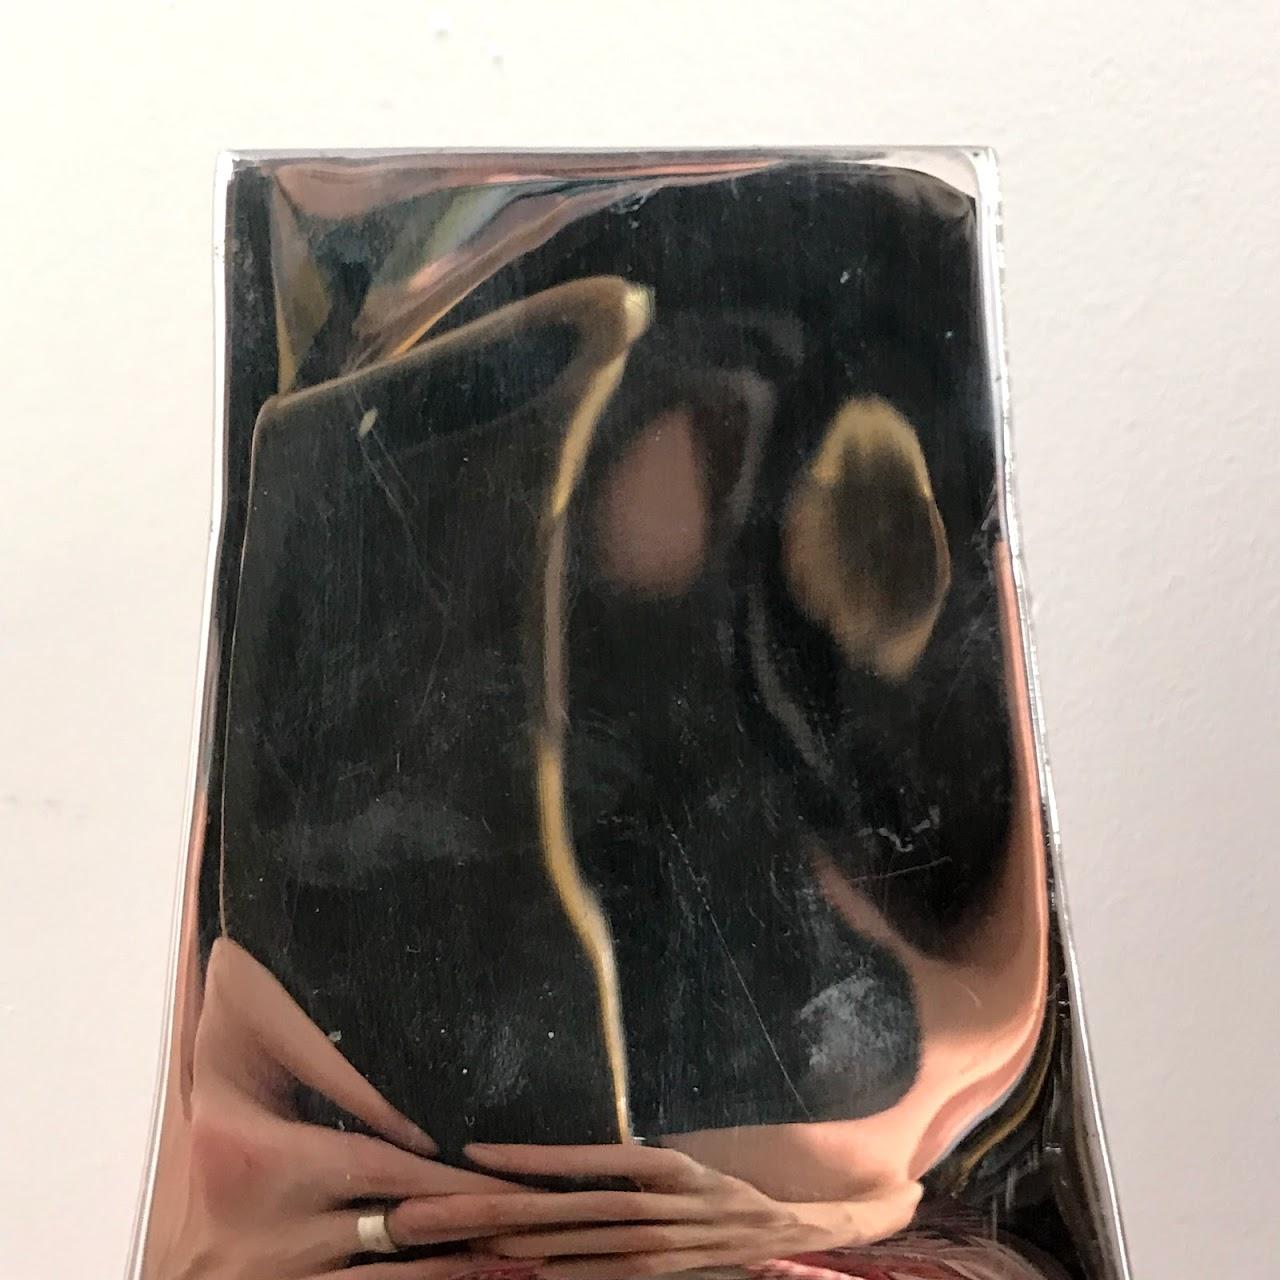 Michael Aram Early 'Relationship' Vase